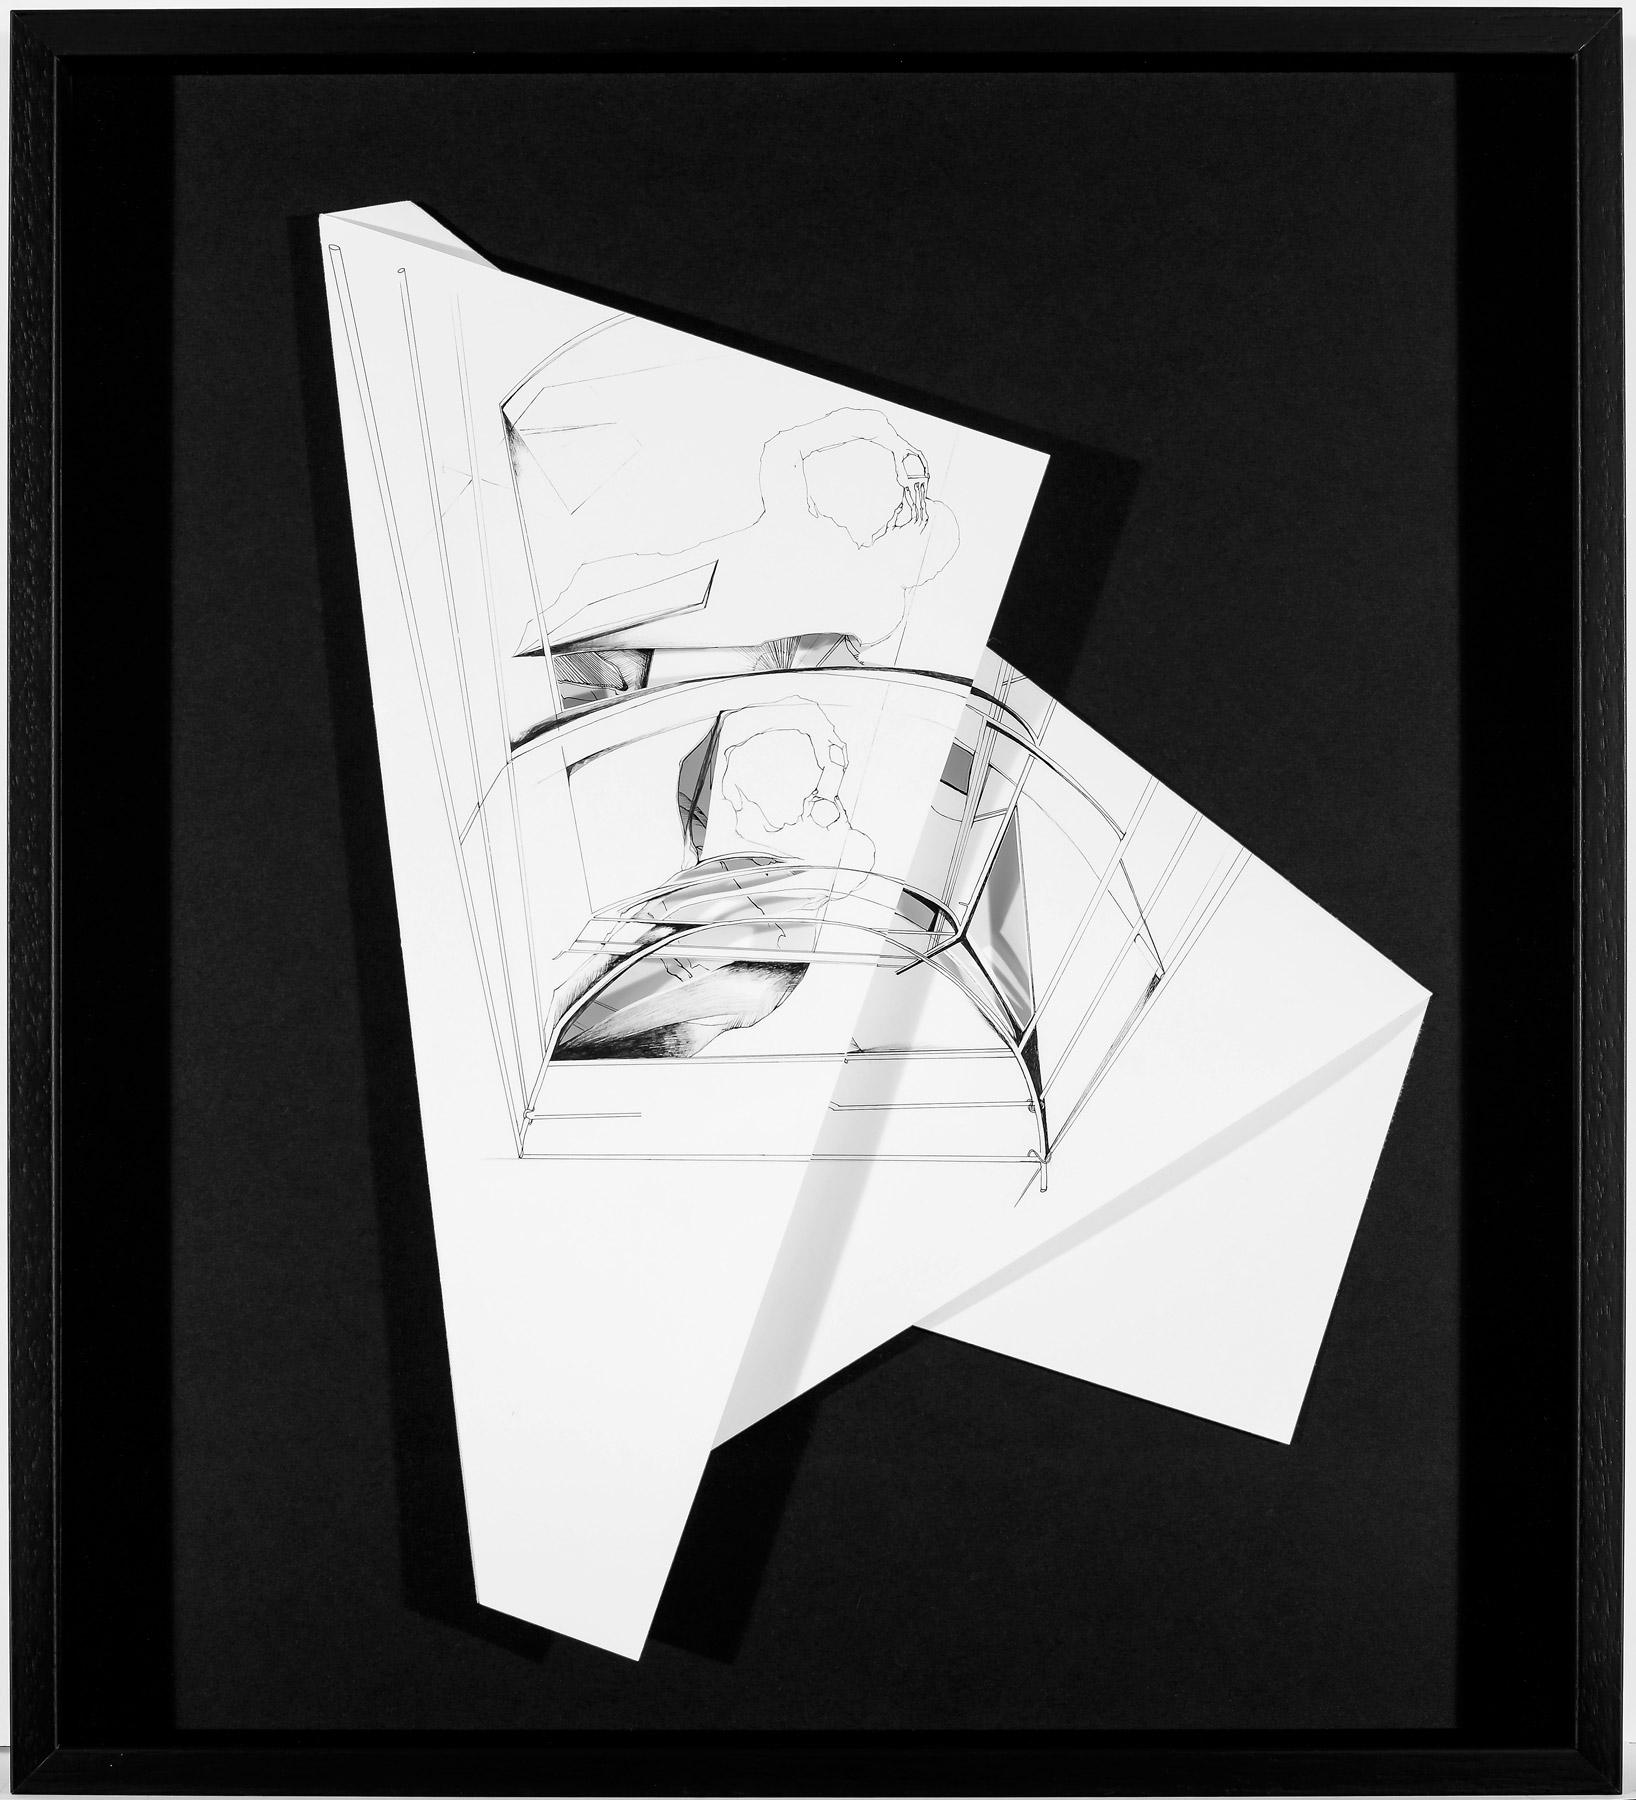 Nina Annabelle Märkl   Hidden Tracks IV   Ink on folded paper cut outs   40 x 36 cm   2015